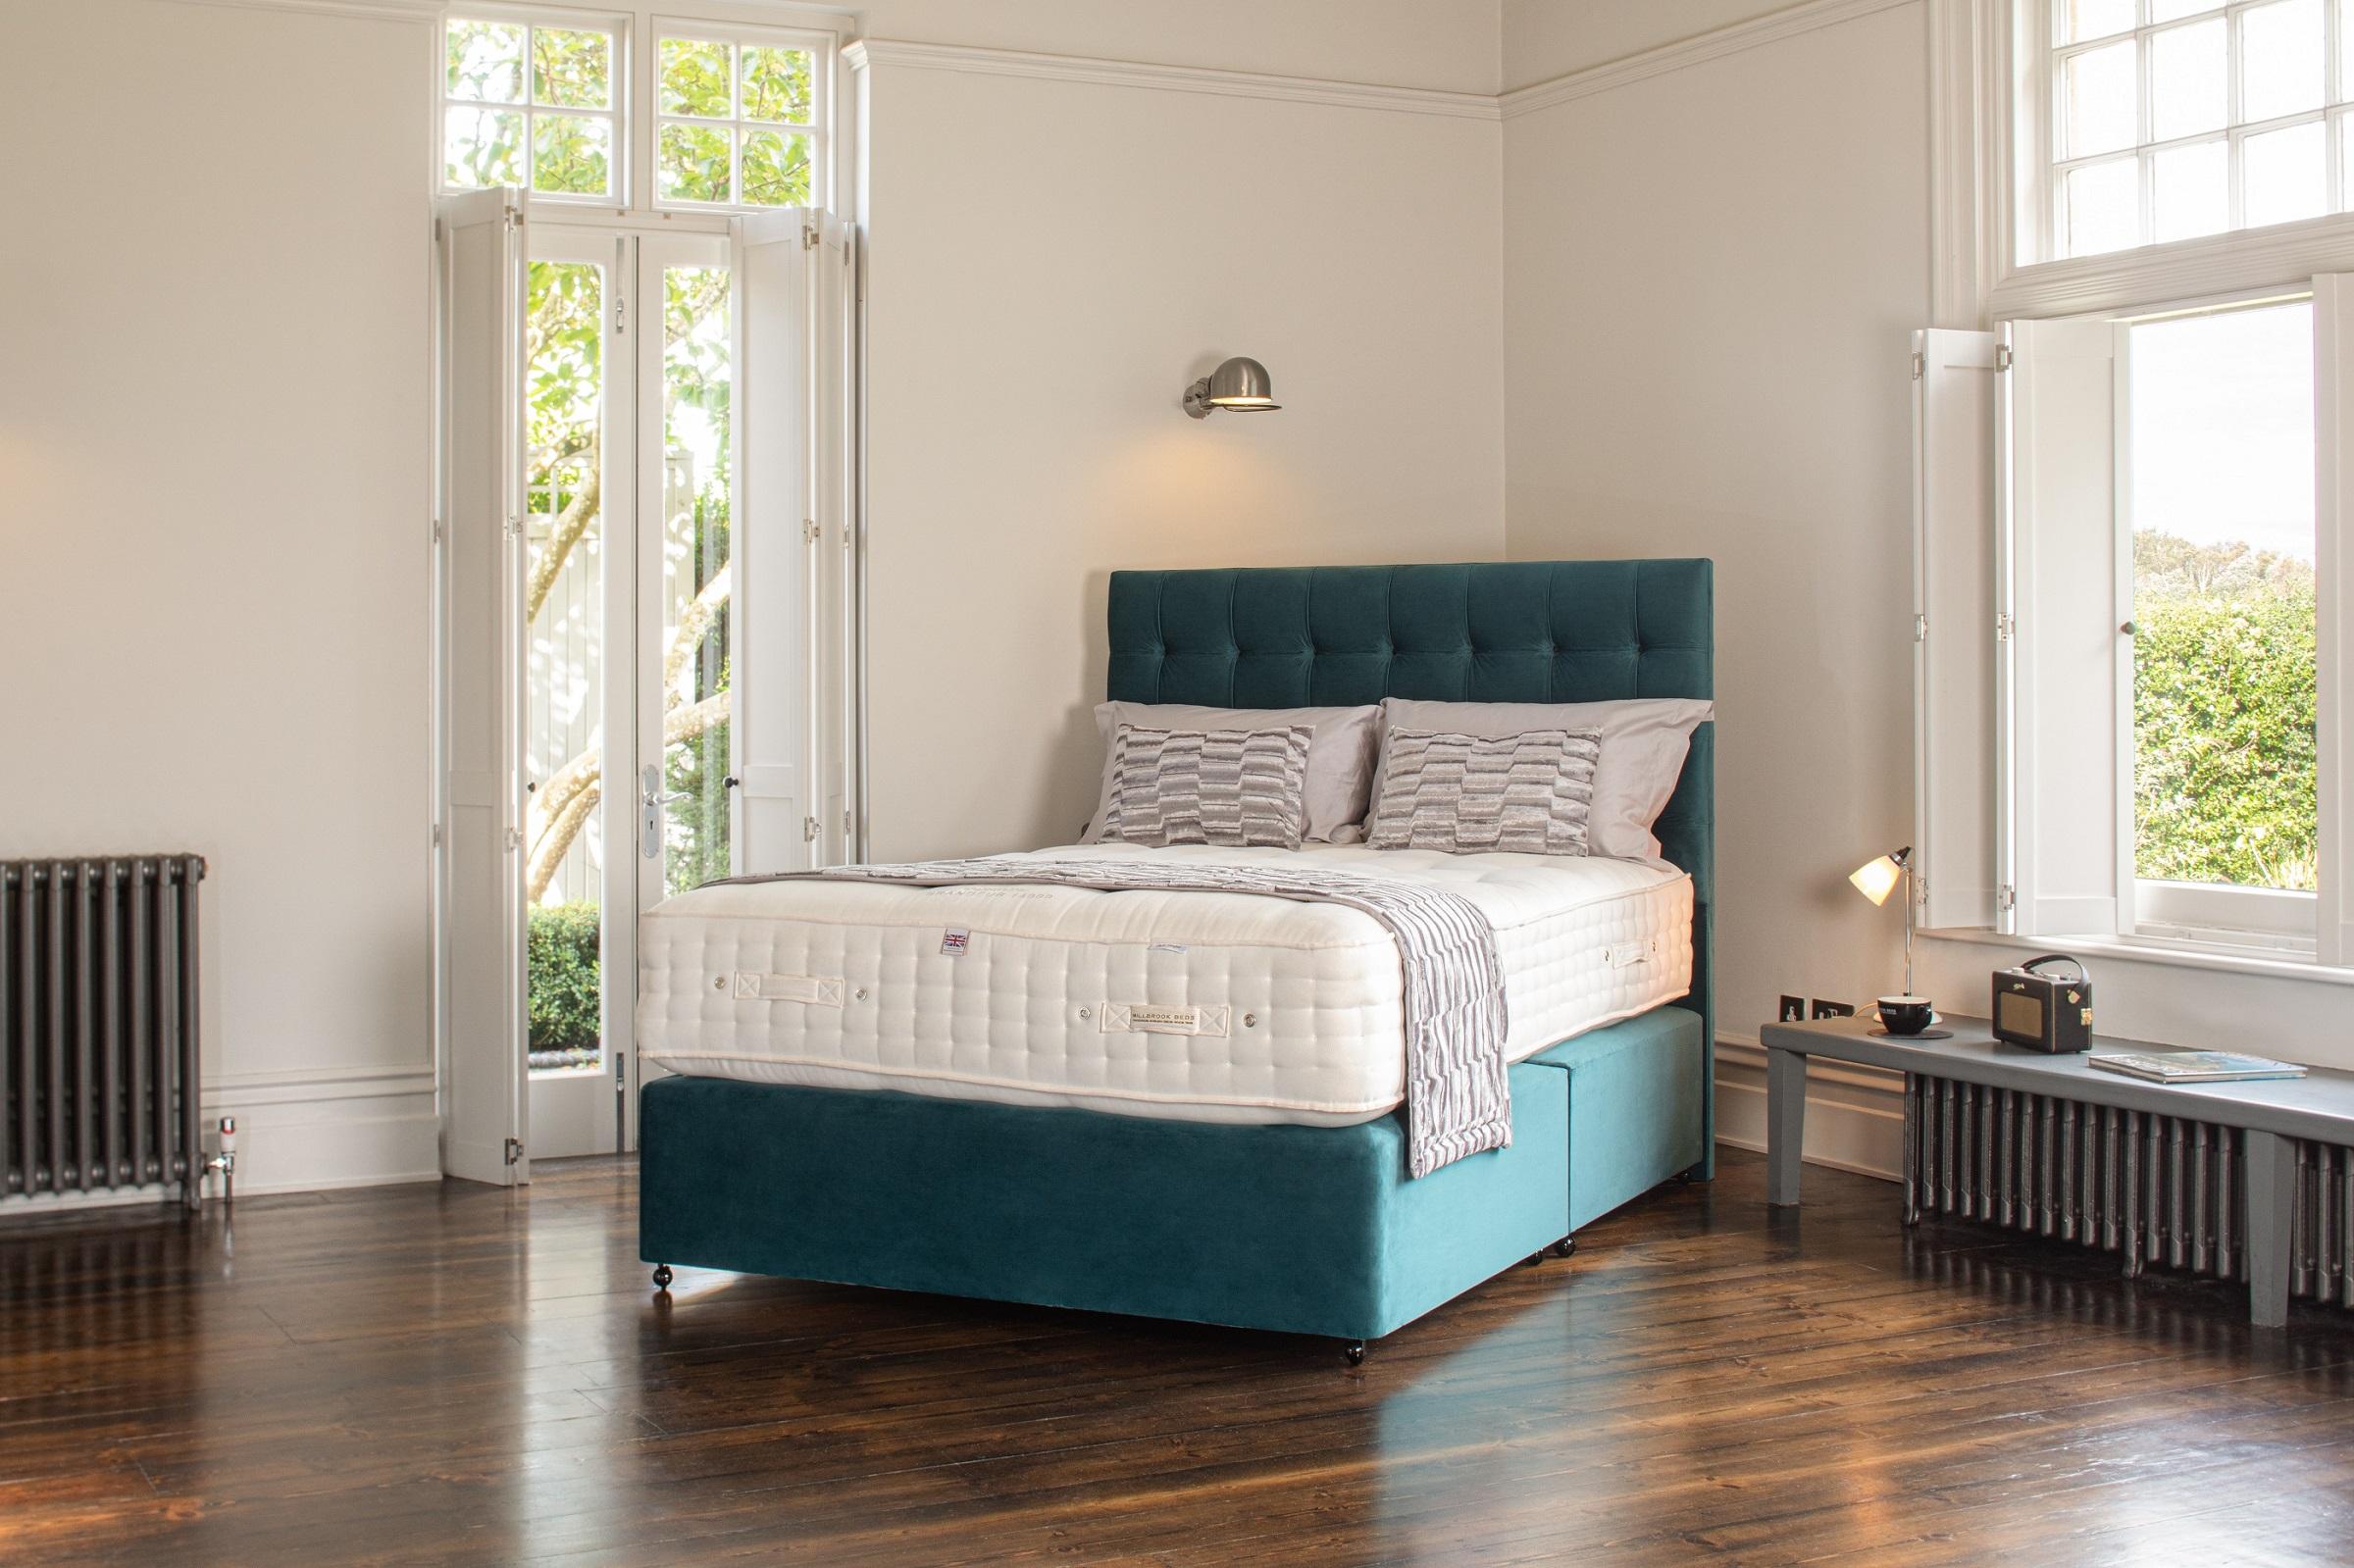 Amazing British Beds Worldwide Luxury Beds Delivered Worldwide Ibusinesslaw Wood Chair Design Ideas Ibusinesslaworg